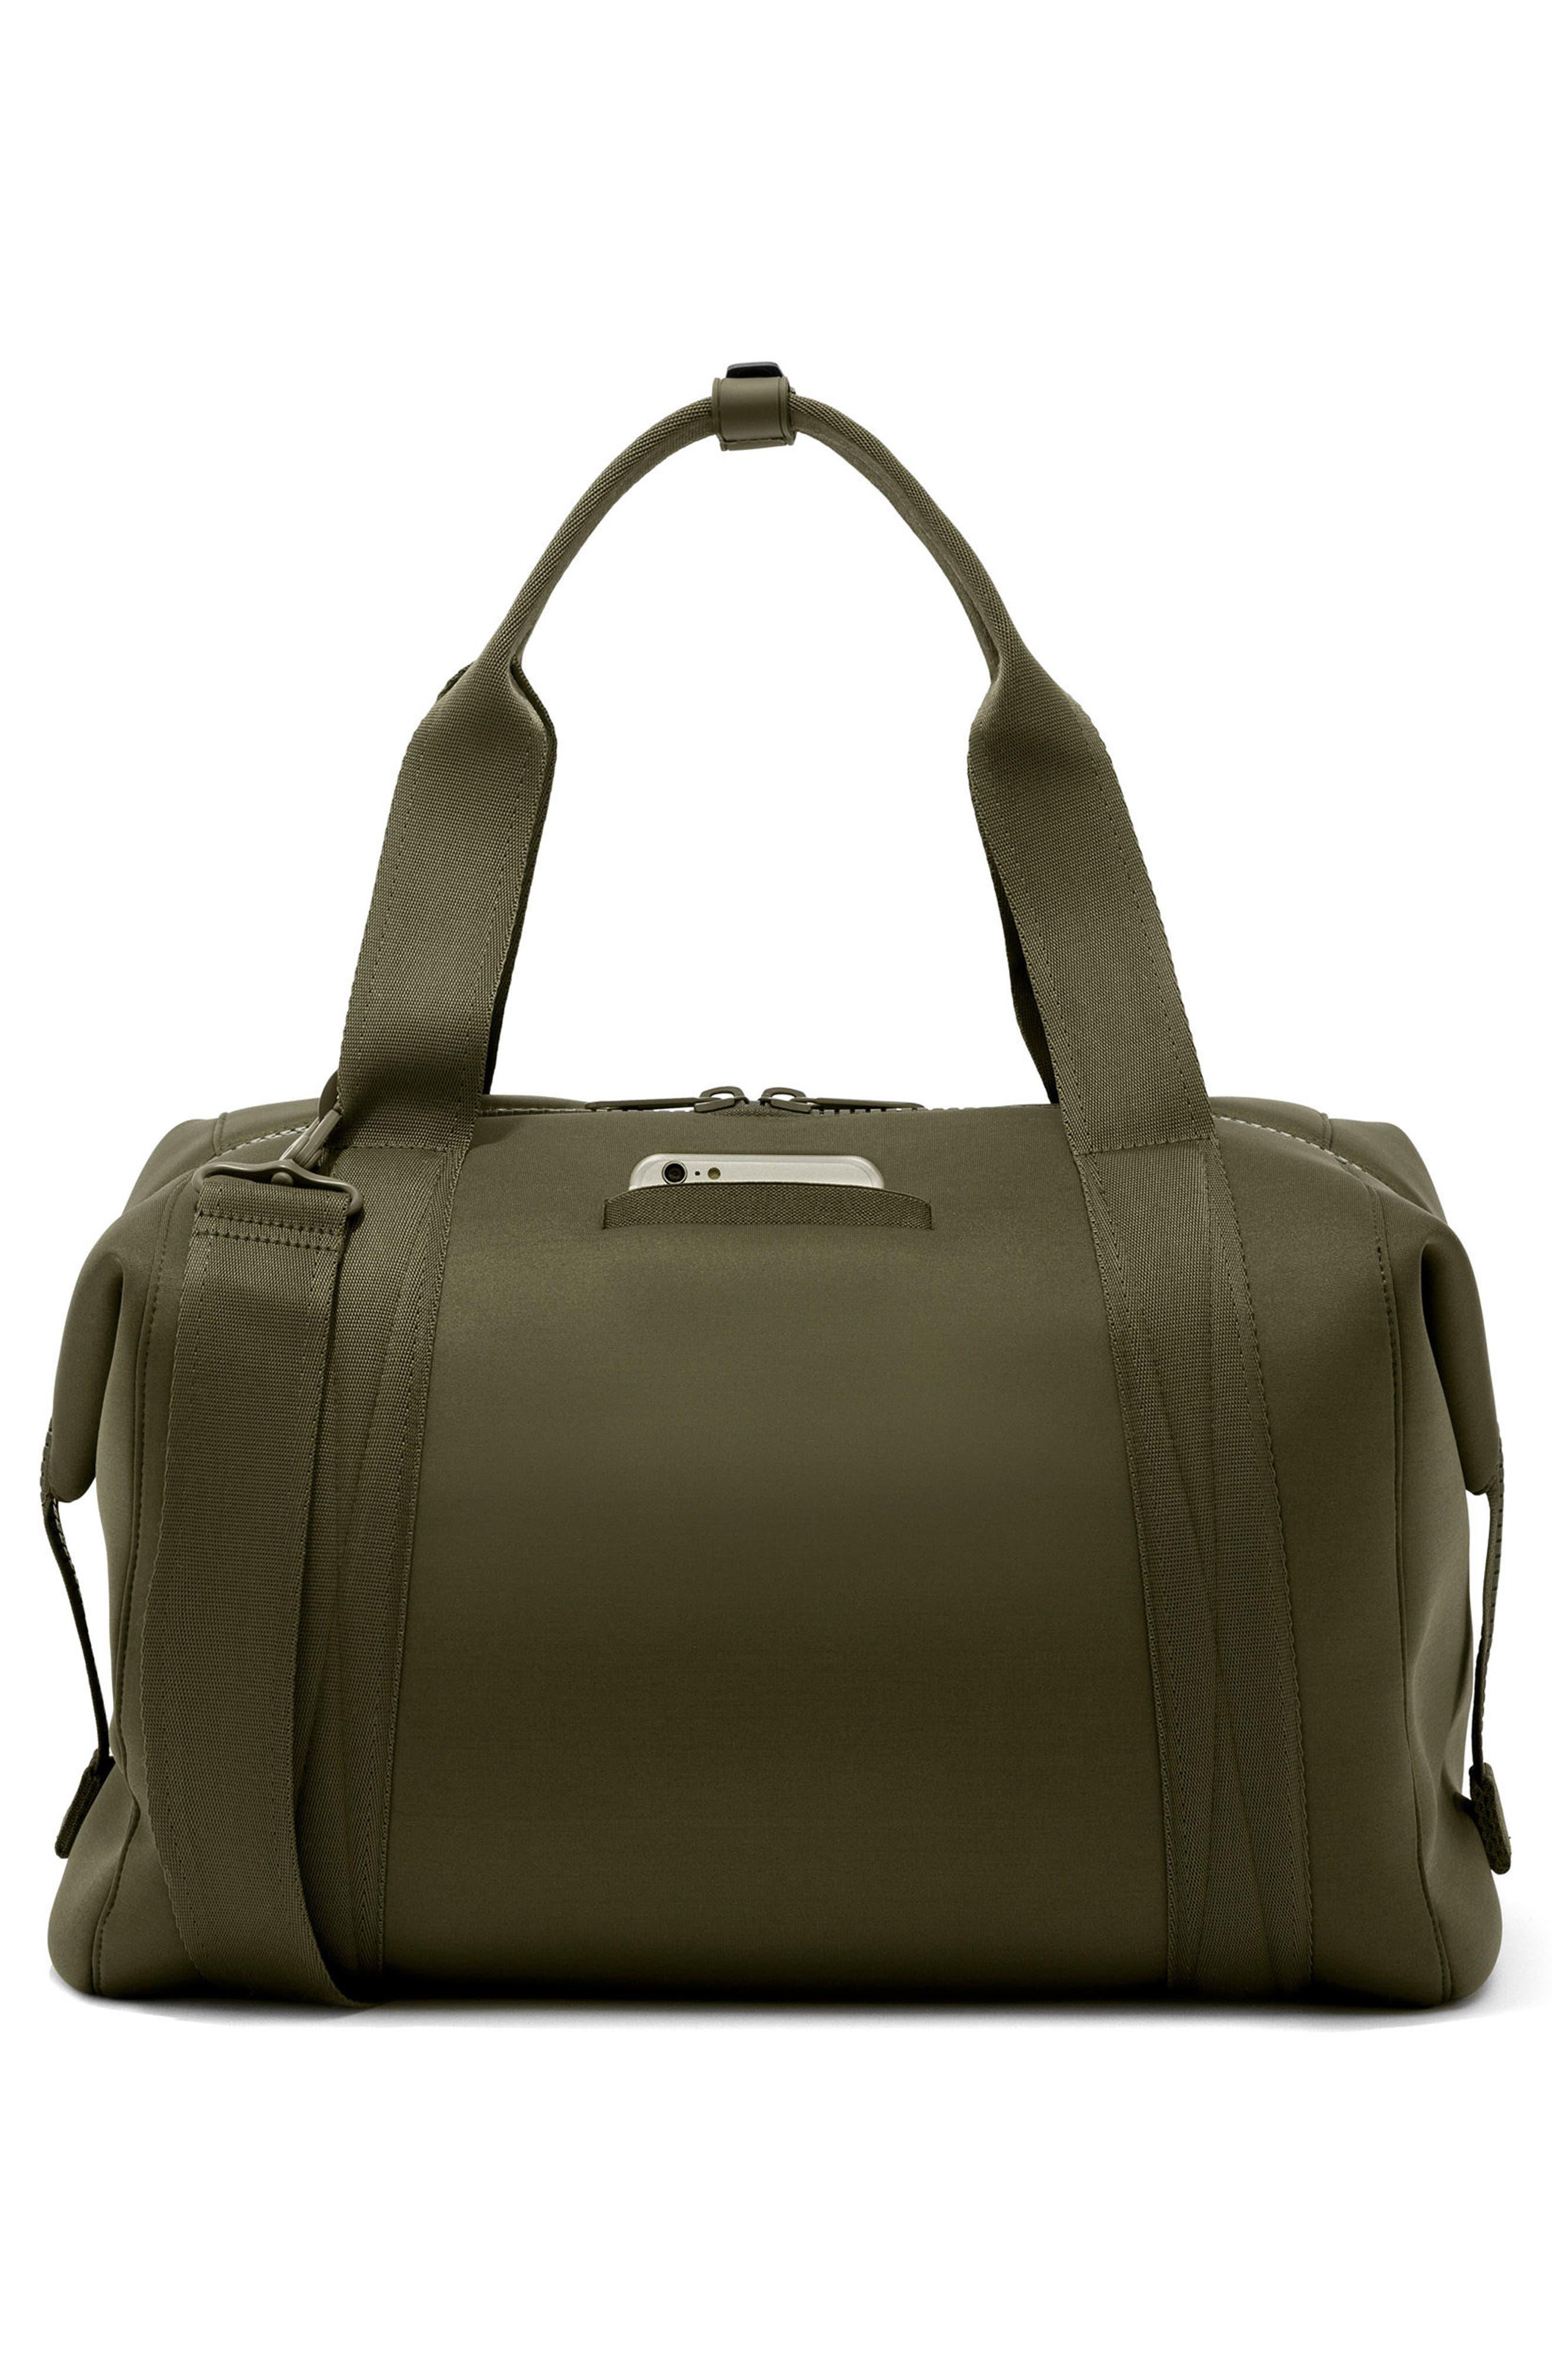 365 Large Landon Neoprene Carryall Duffel Bag,                             Alternate thumbnail 13, color,